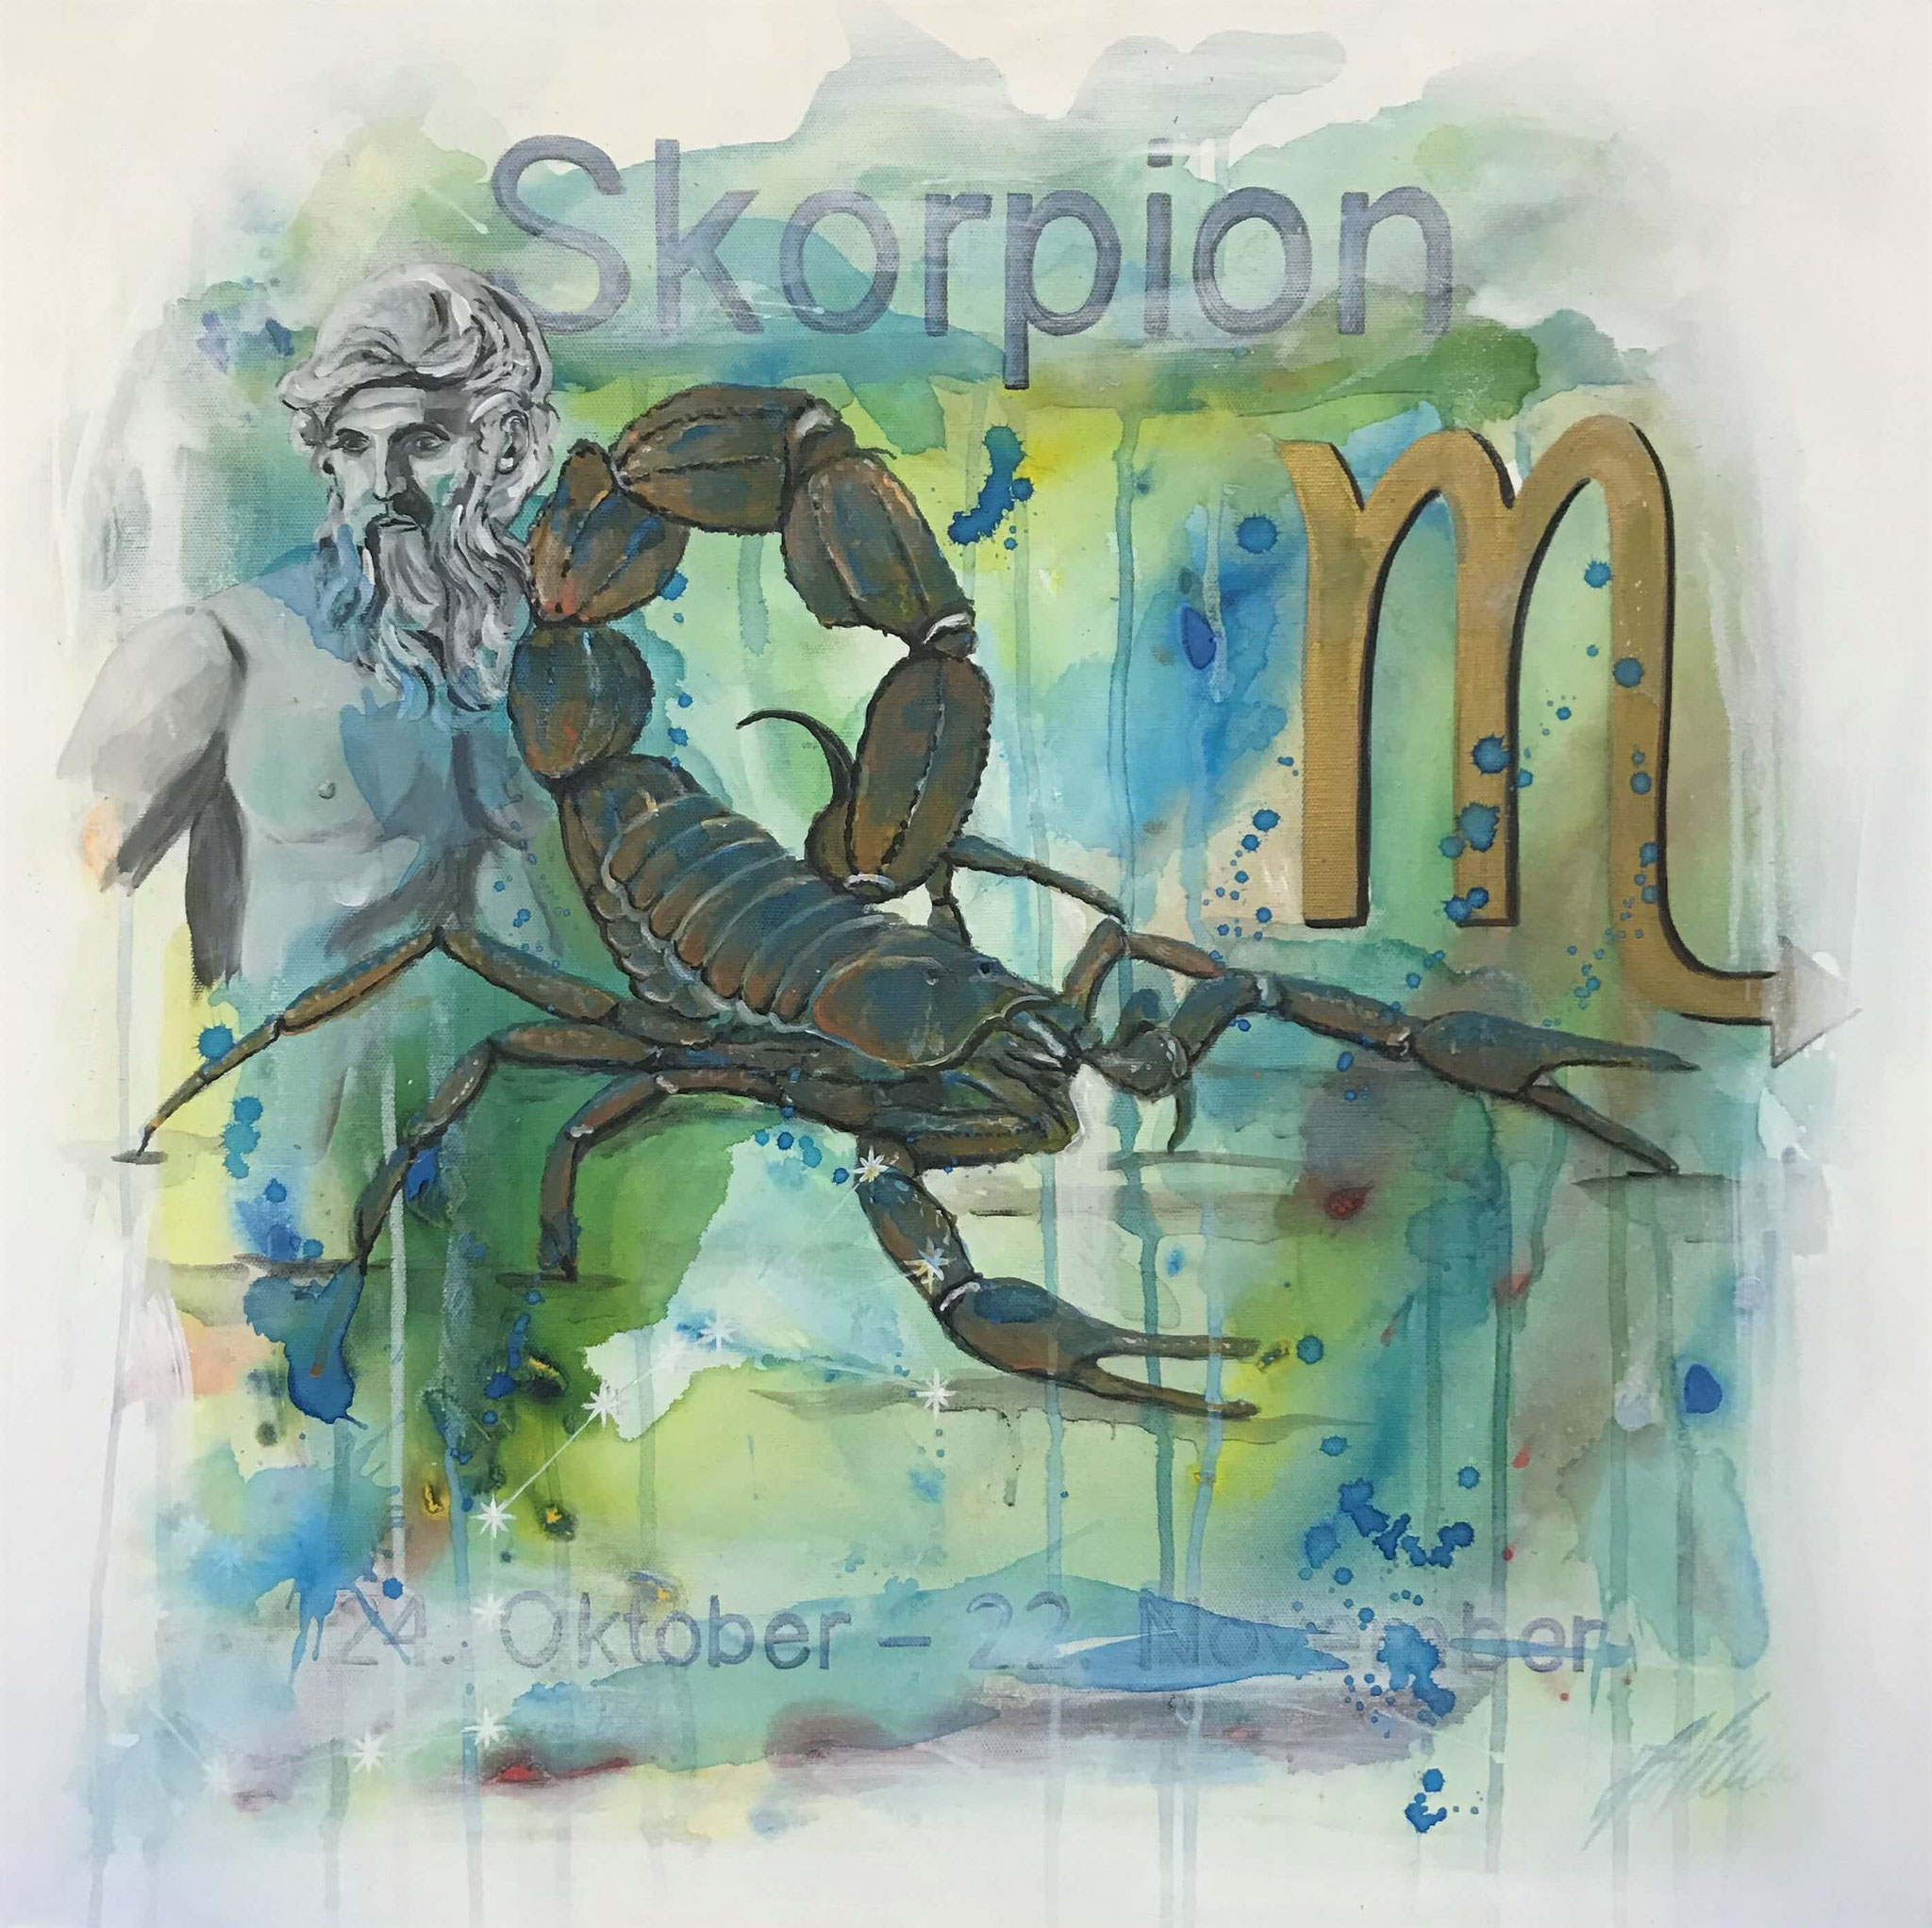 "Fr. 480.00 ""Skorpion, Serie antik"" Acryl auf Leinwand mit Rahmen 60 x 60 cm."